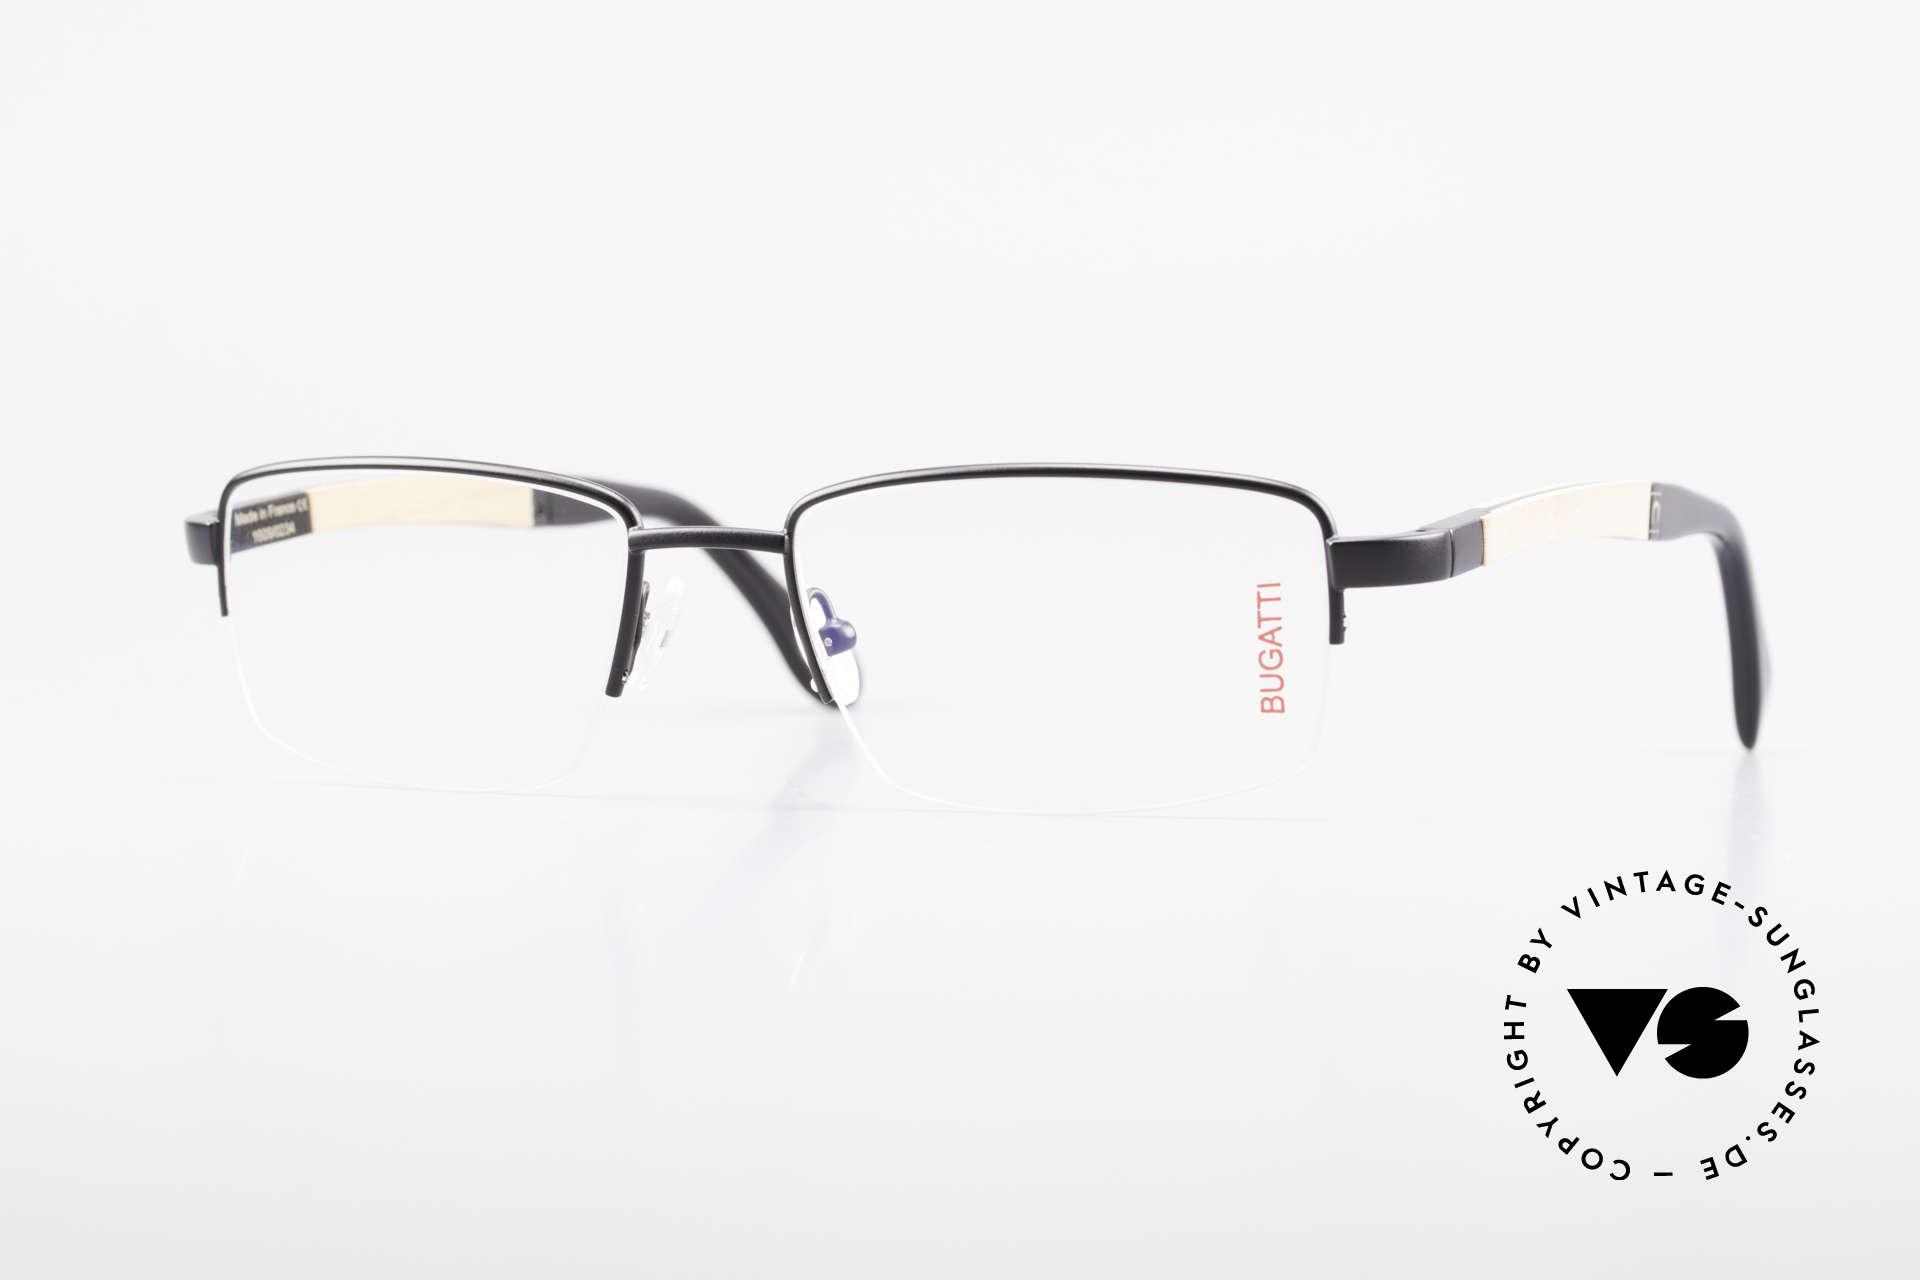 Bugatti 547 Walnut Wood Luxury Glasses L, BUGATTI vintage eyeglasses of incredible top-quality, Made for Men